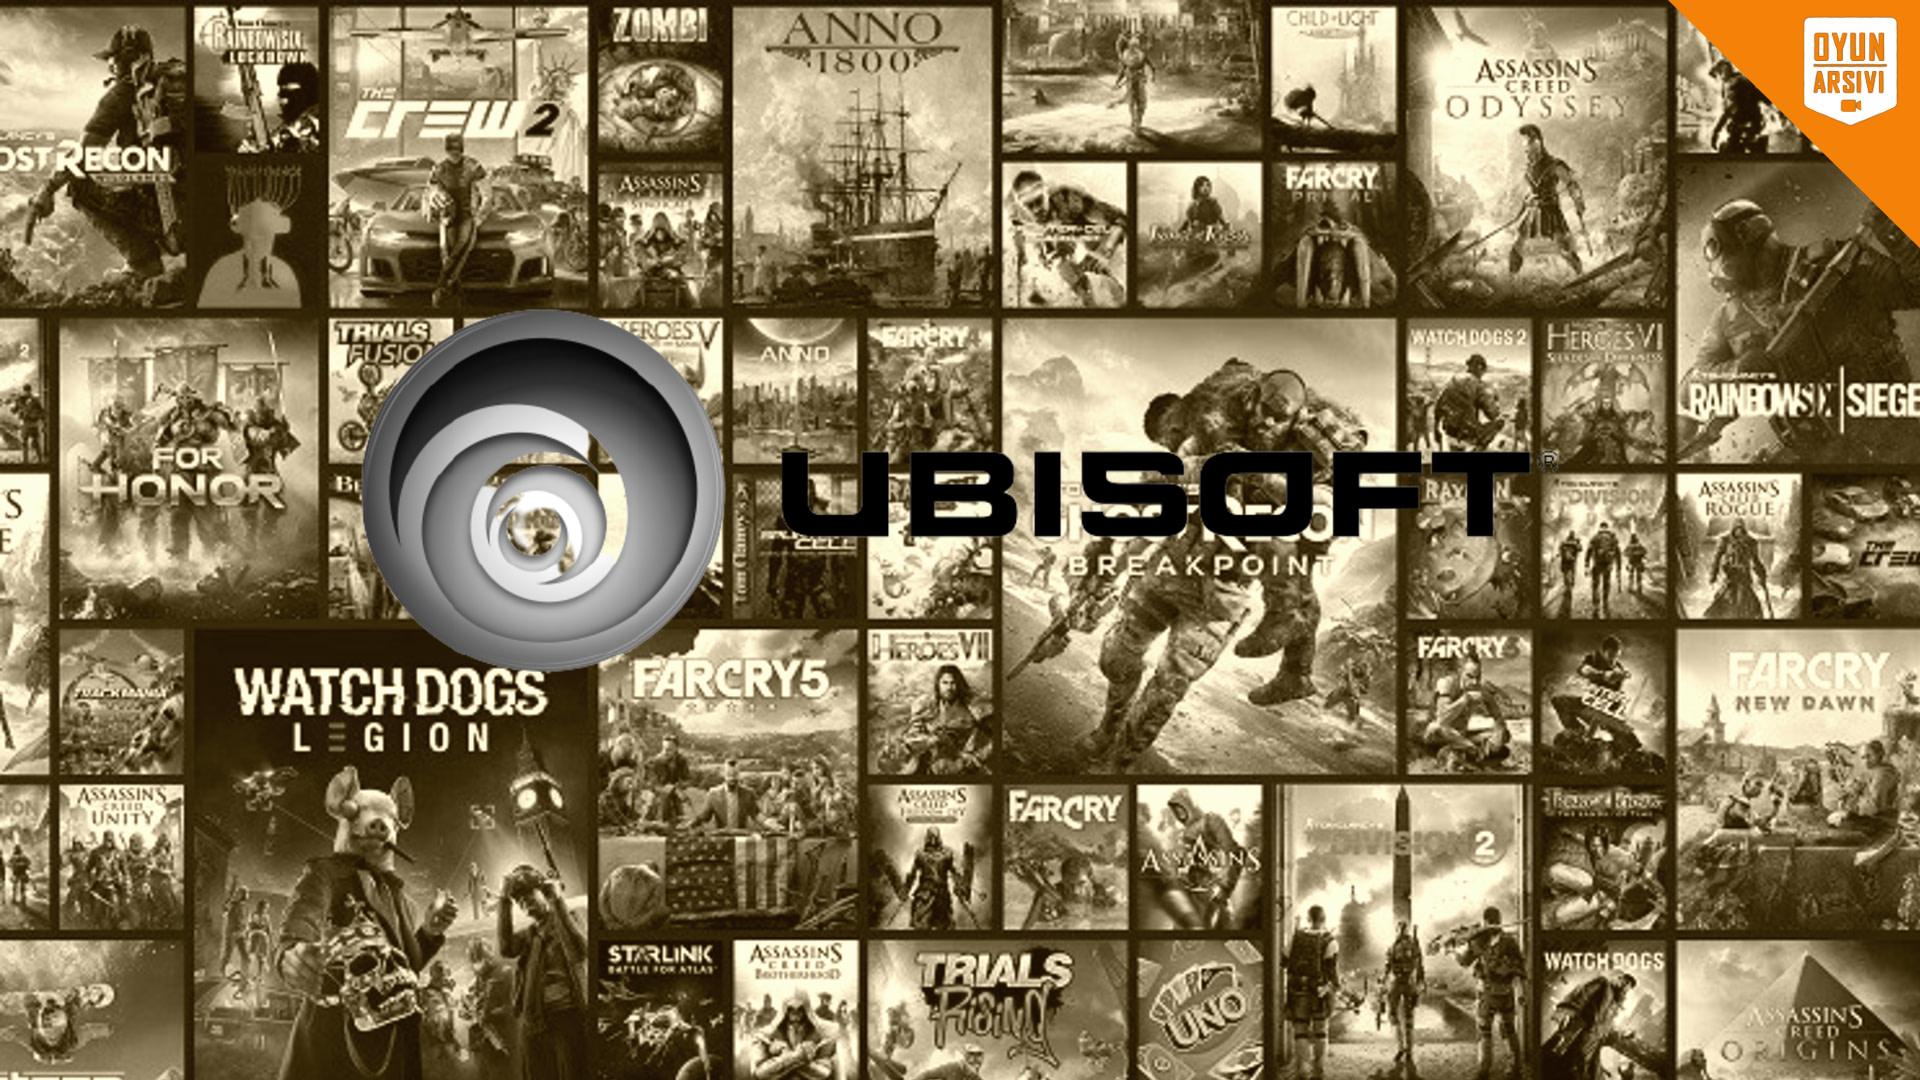 Ubisoft DDos Saldırısı Davası Oyun Arşivi